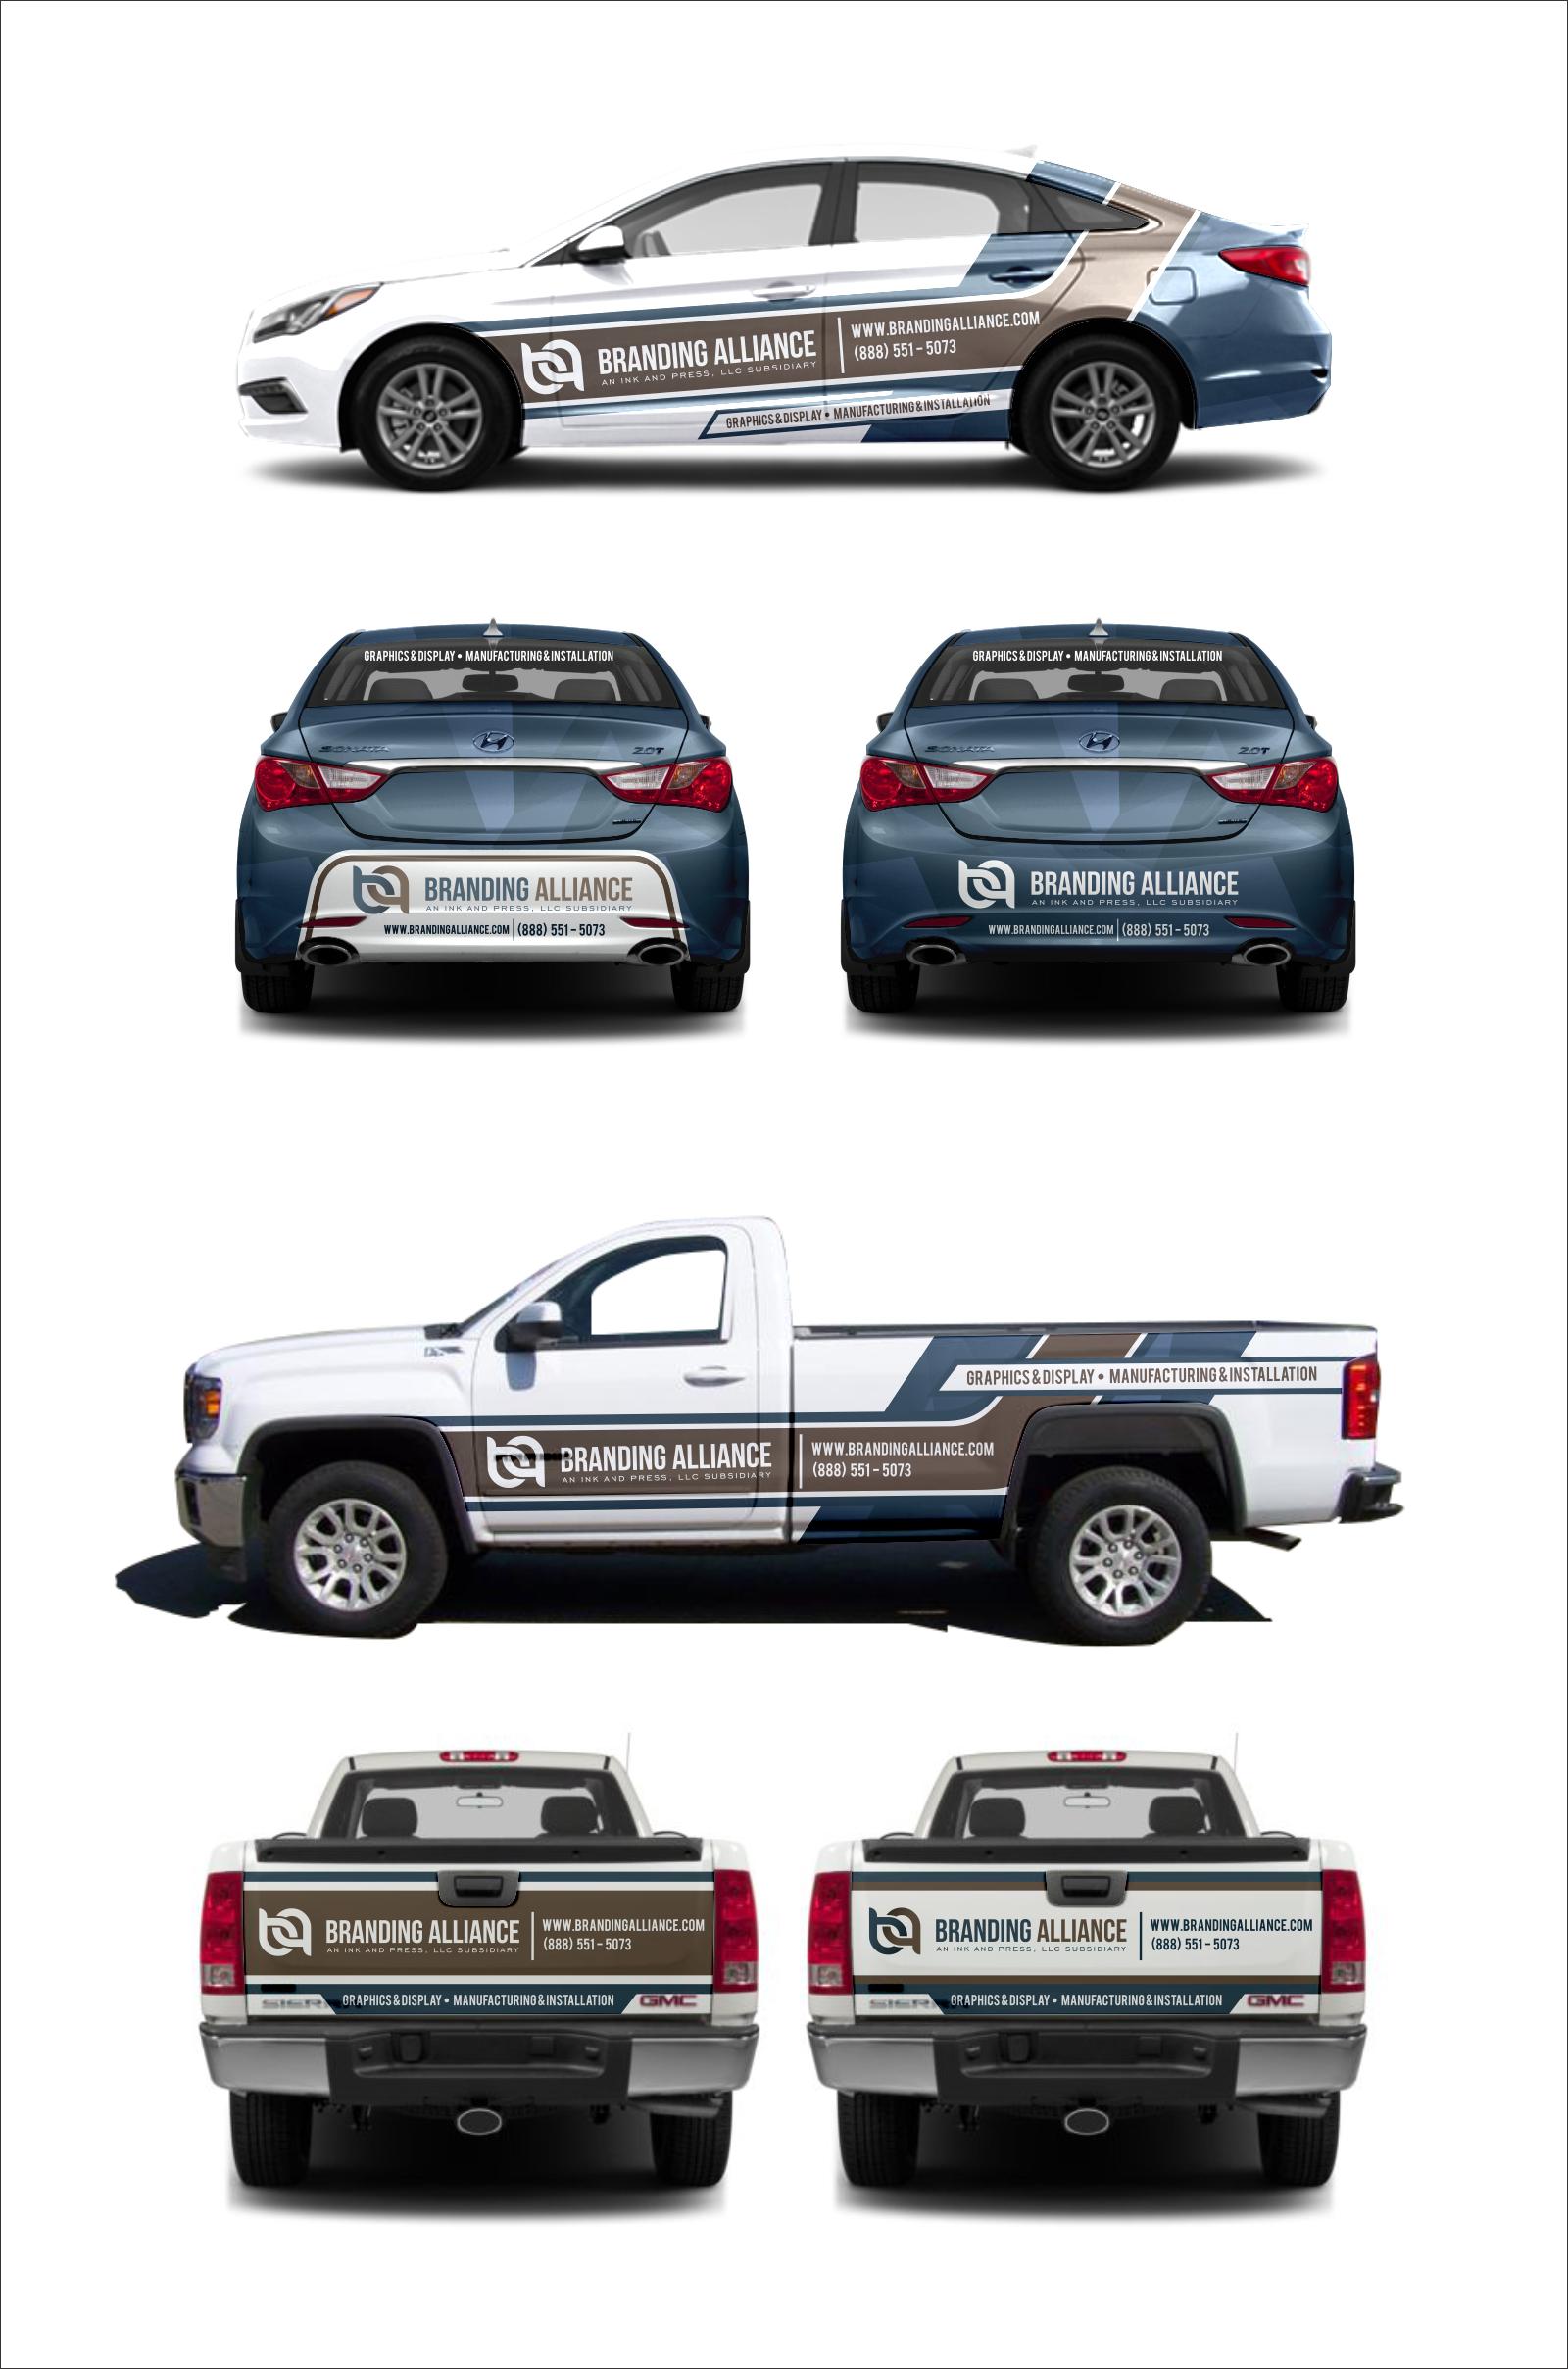 Informative & Stylish - High Impact Vehicle Wrap Design